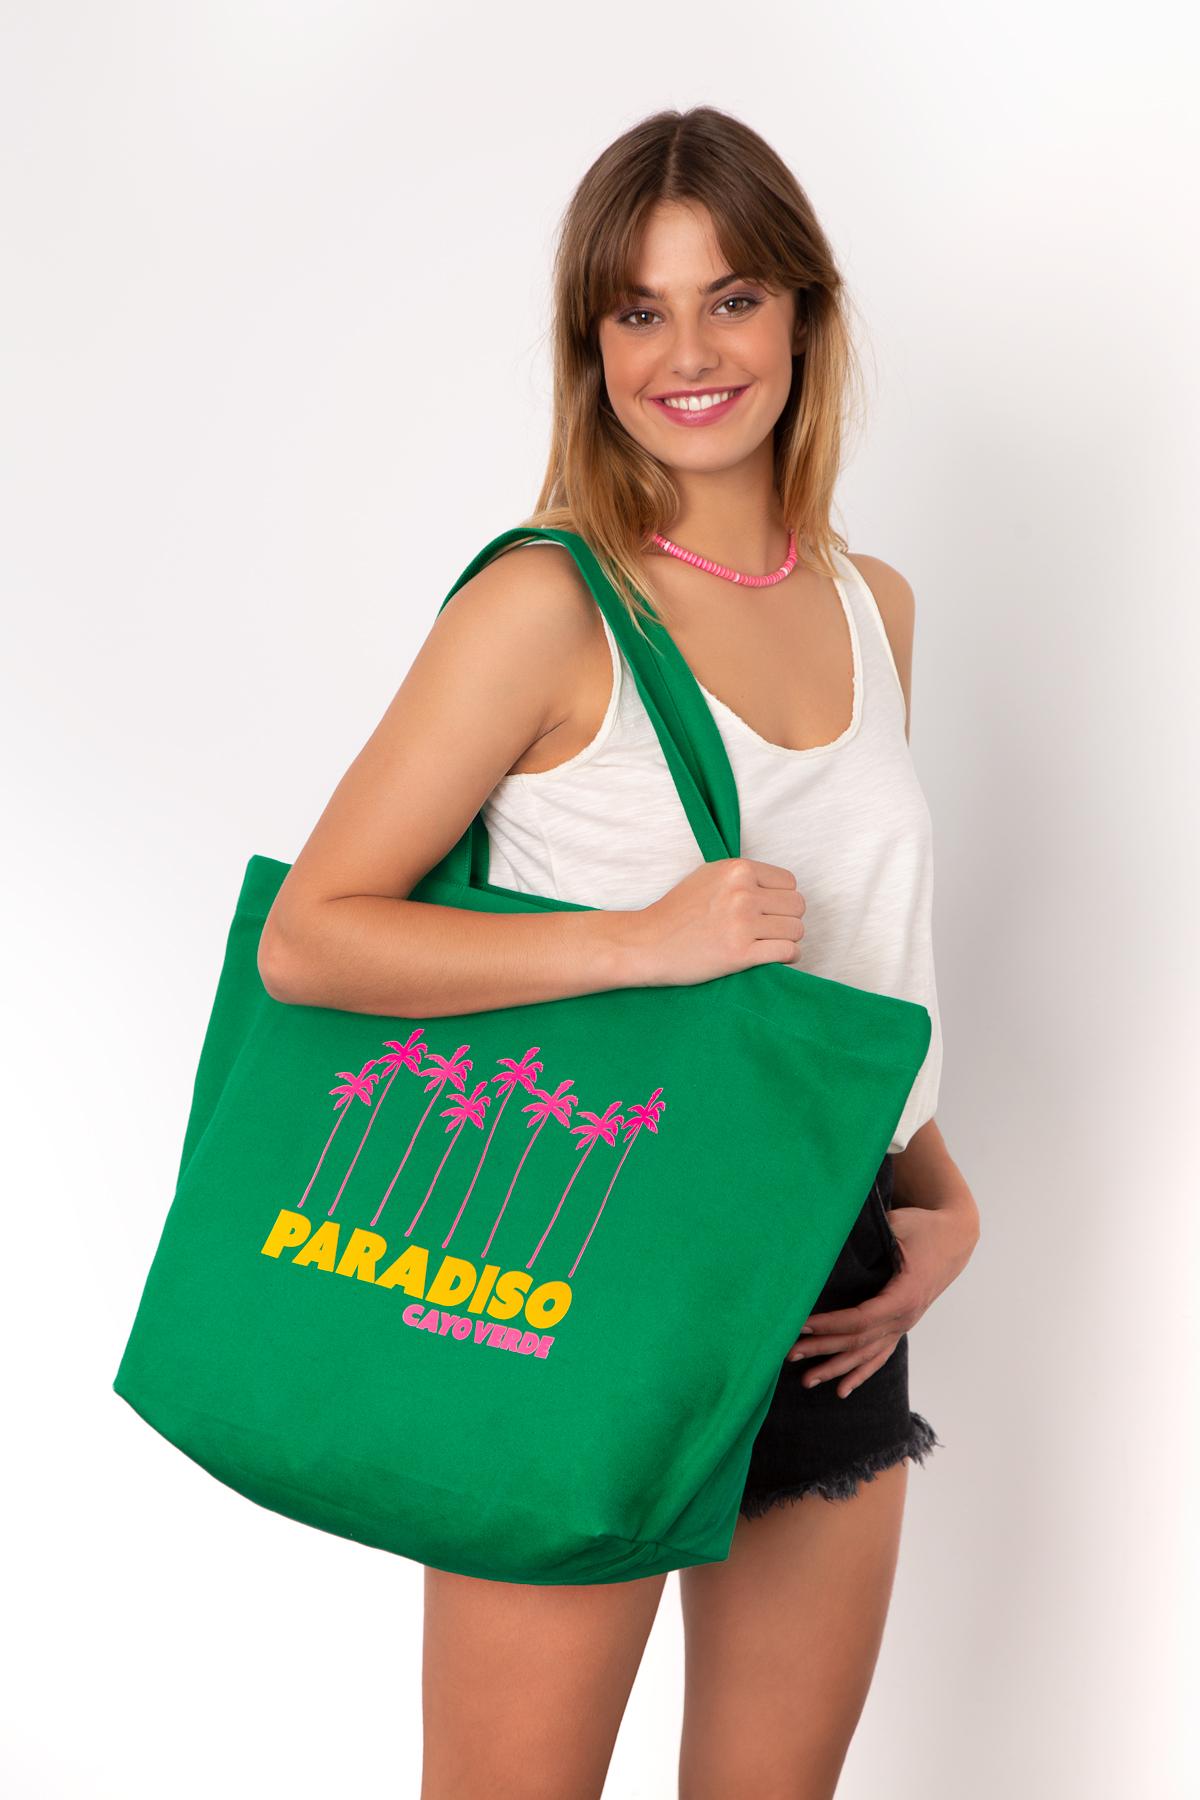 BeachBag XL PARADISO French Disorder